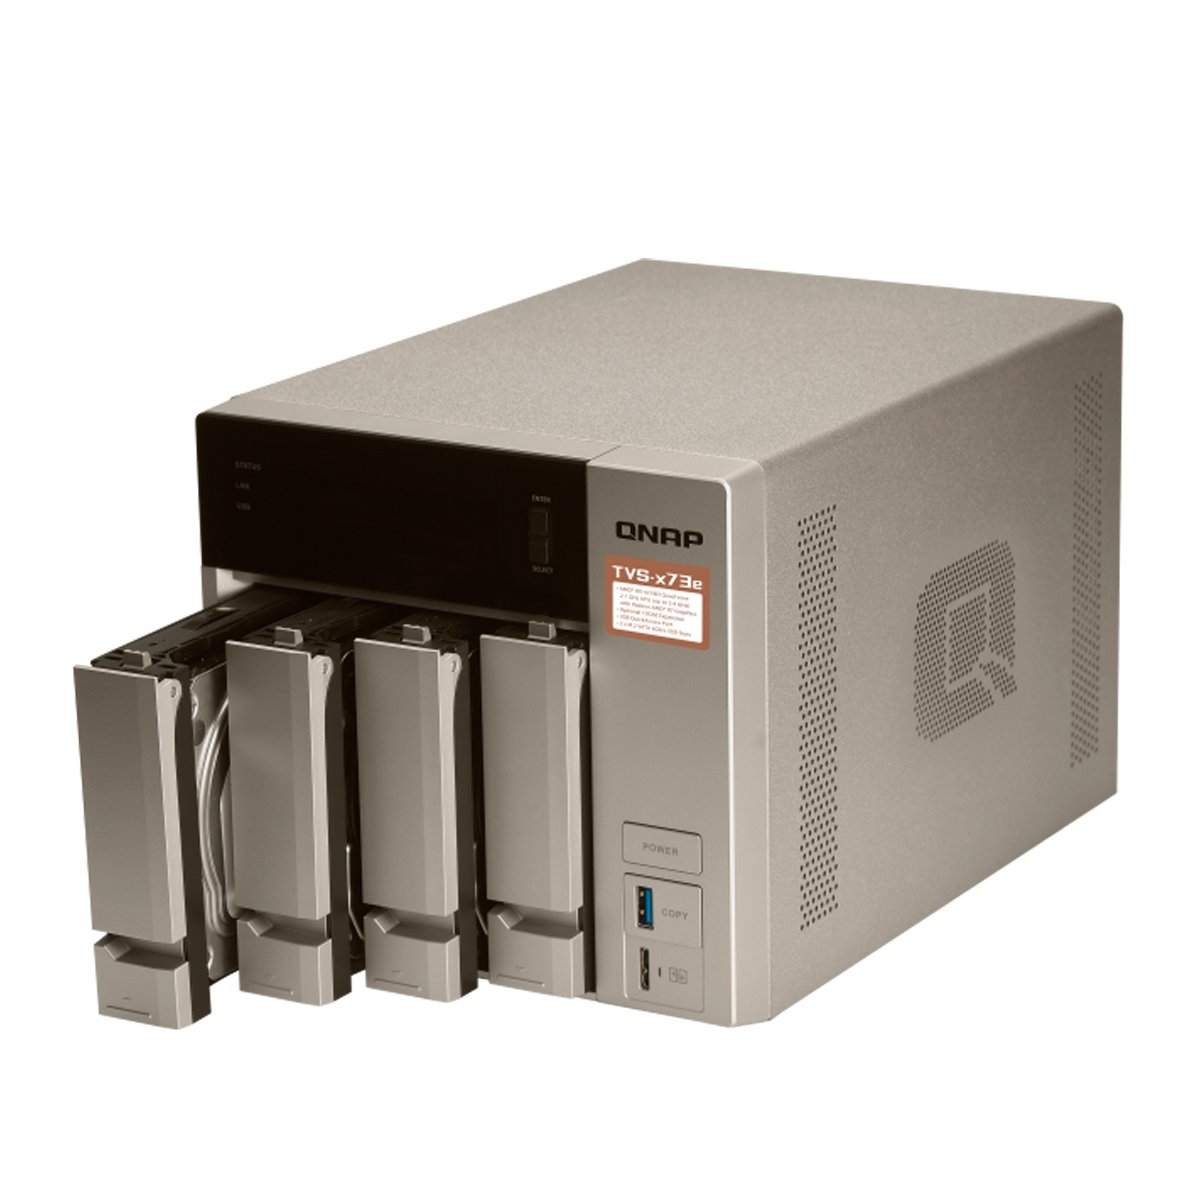 Amazon.com: QNAP TVS-473e-8G-US 4-bay NAS/iSCSI IP-SAN, AMD R series Quad-core 2.1GHz, 8GB RAM, 10G-ready: Computers & Accessories